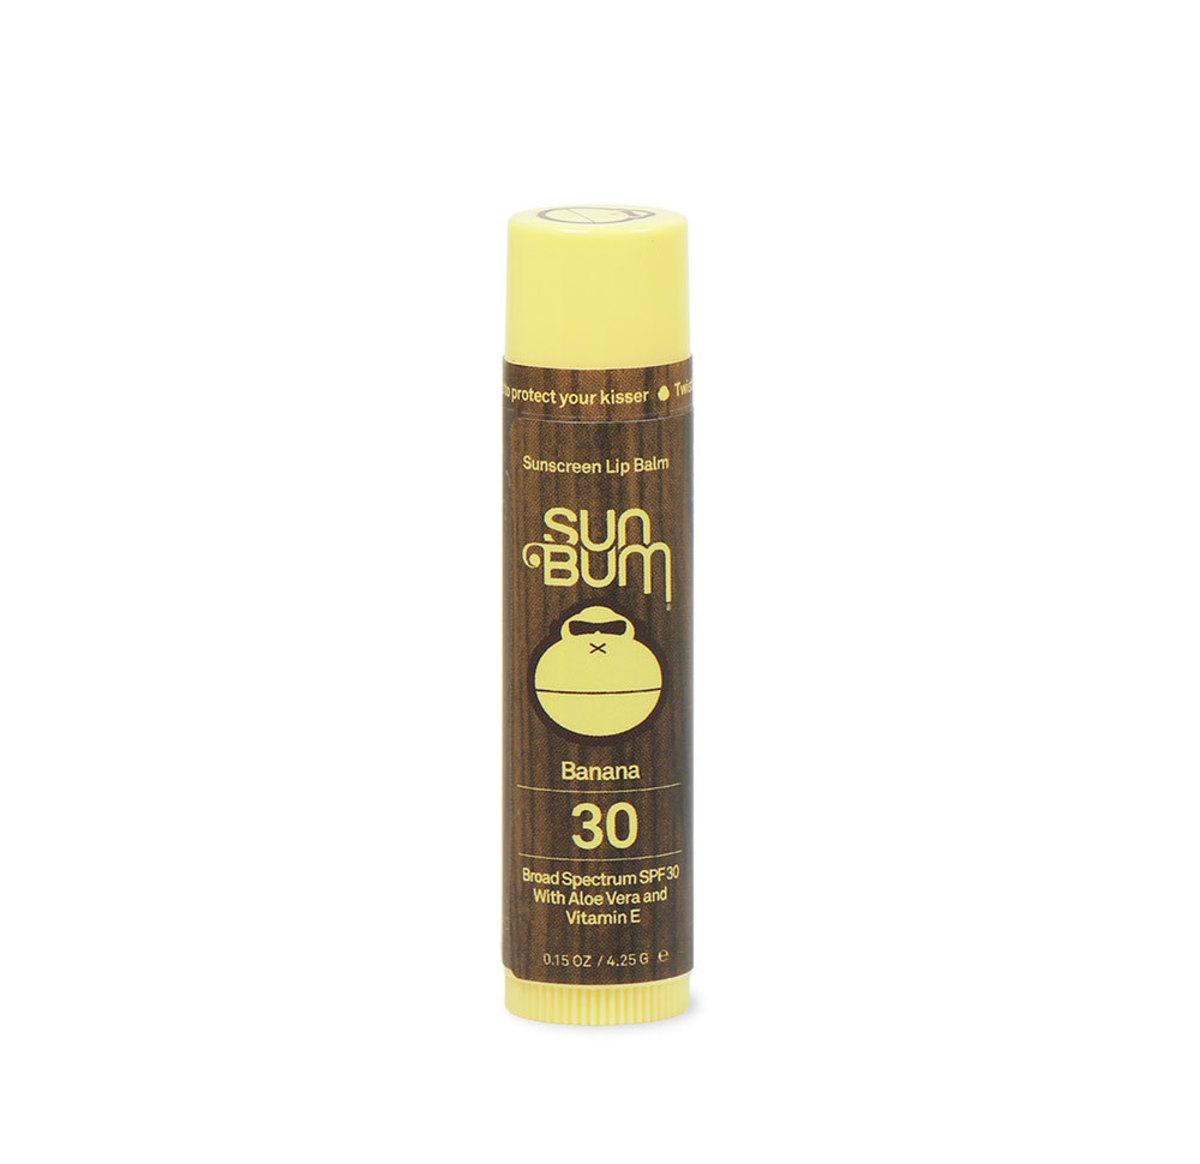 Sun Bum lip balm SPF 30, $3.99, available at Ulta Beauty